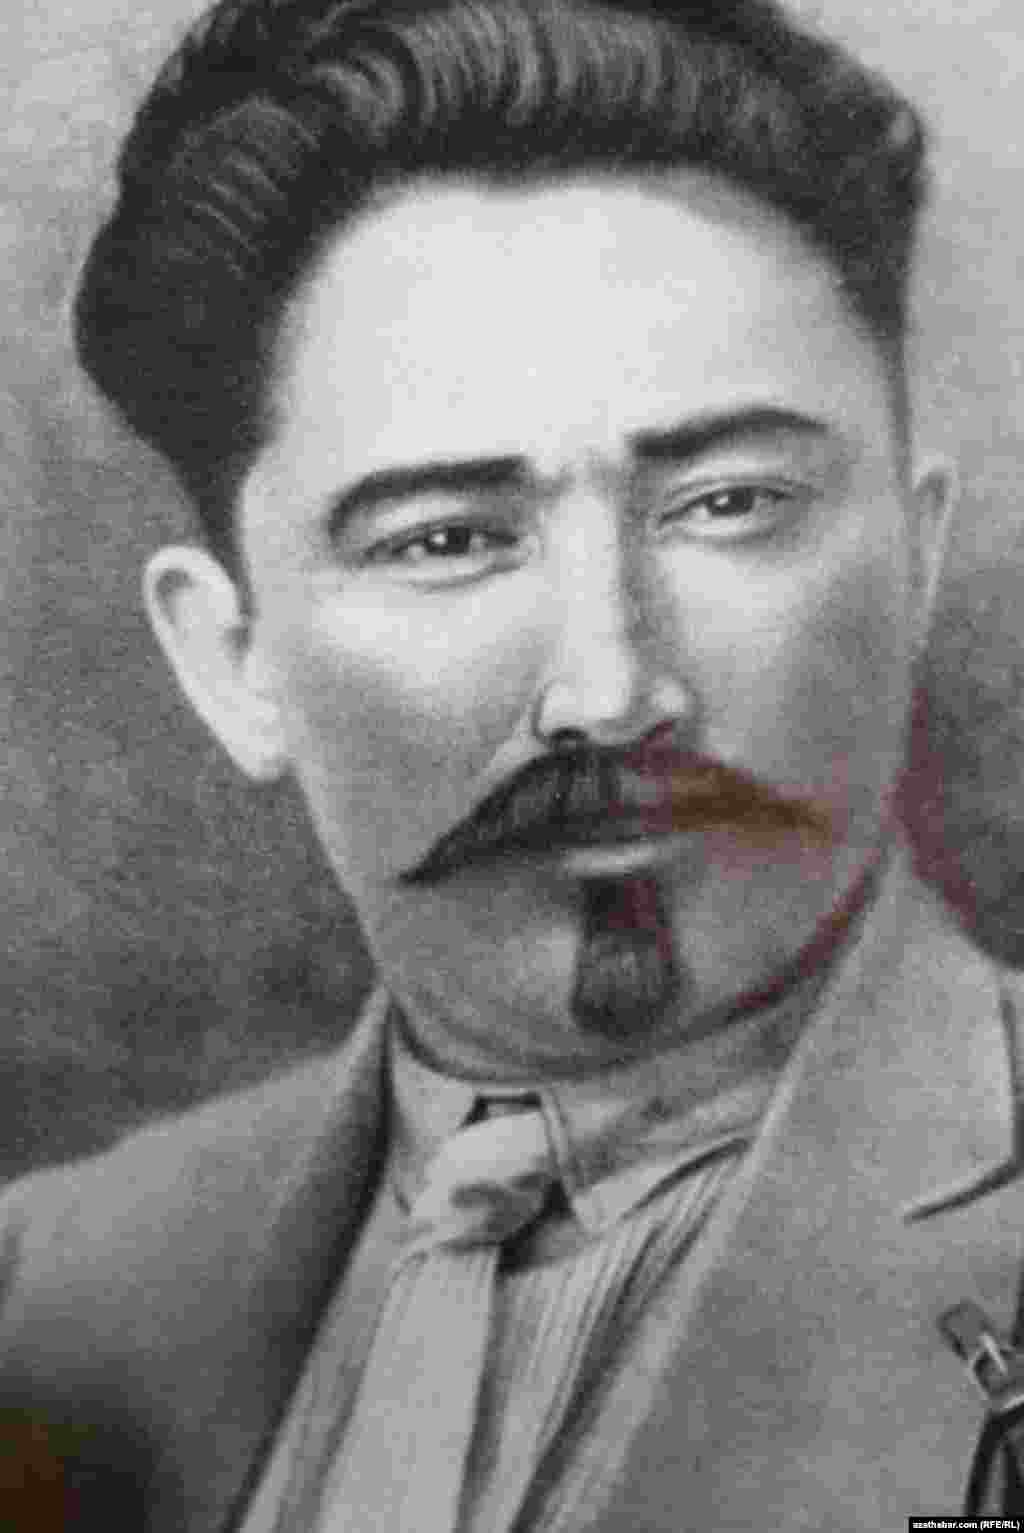 TSSR-iň Merkezi ýerine ýetiriji komitetiniň birinji başlygy Nedirbay Aytakow